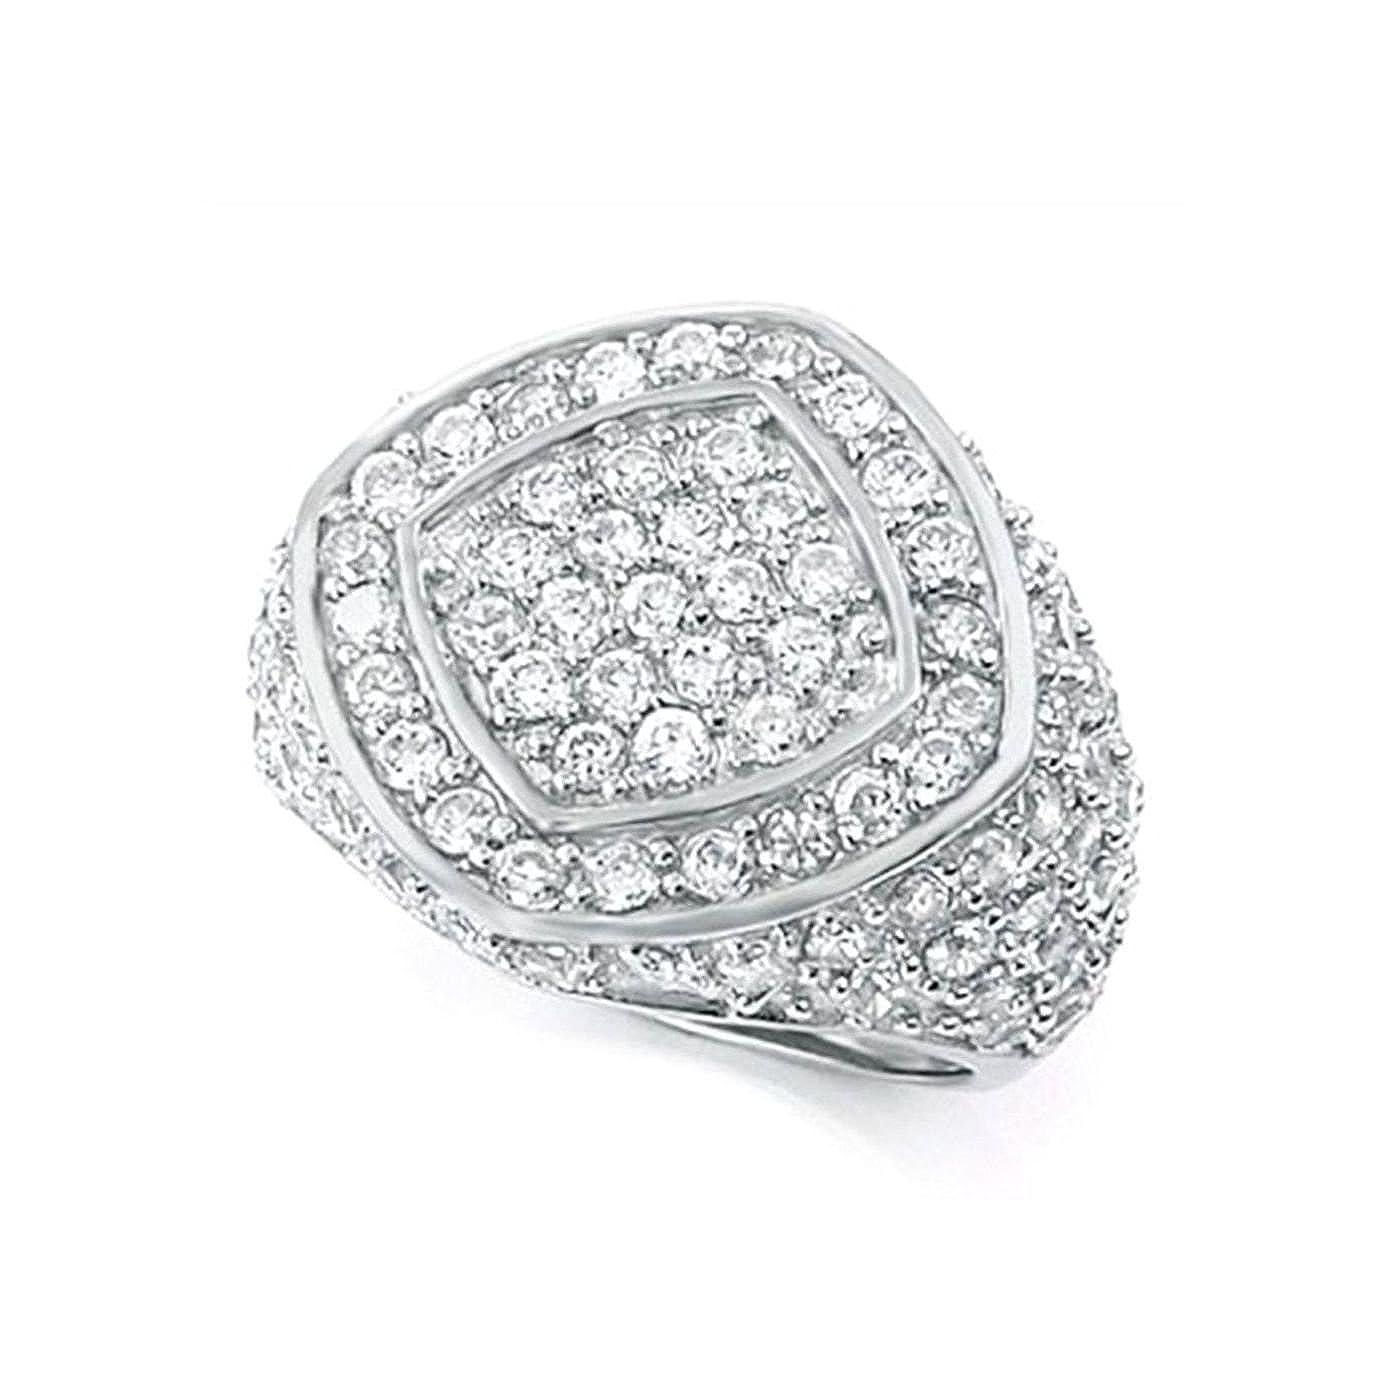 19 mm Wide mens ring designer Brilliant cut Solid 925 Silver